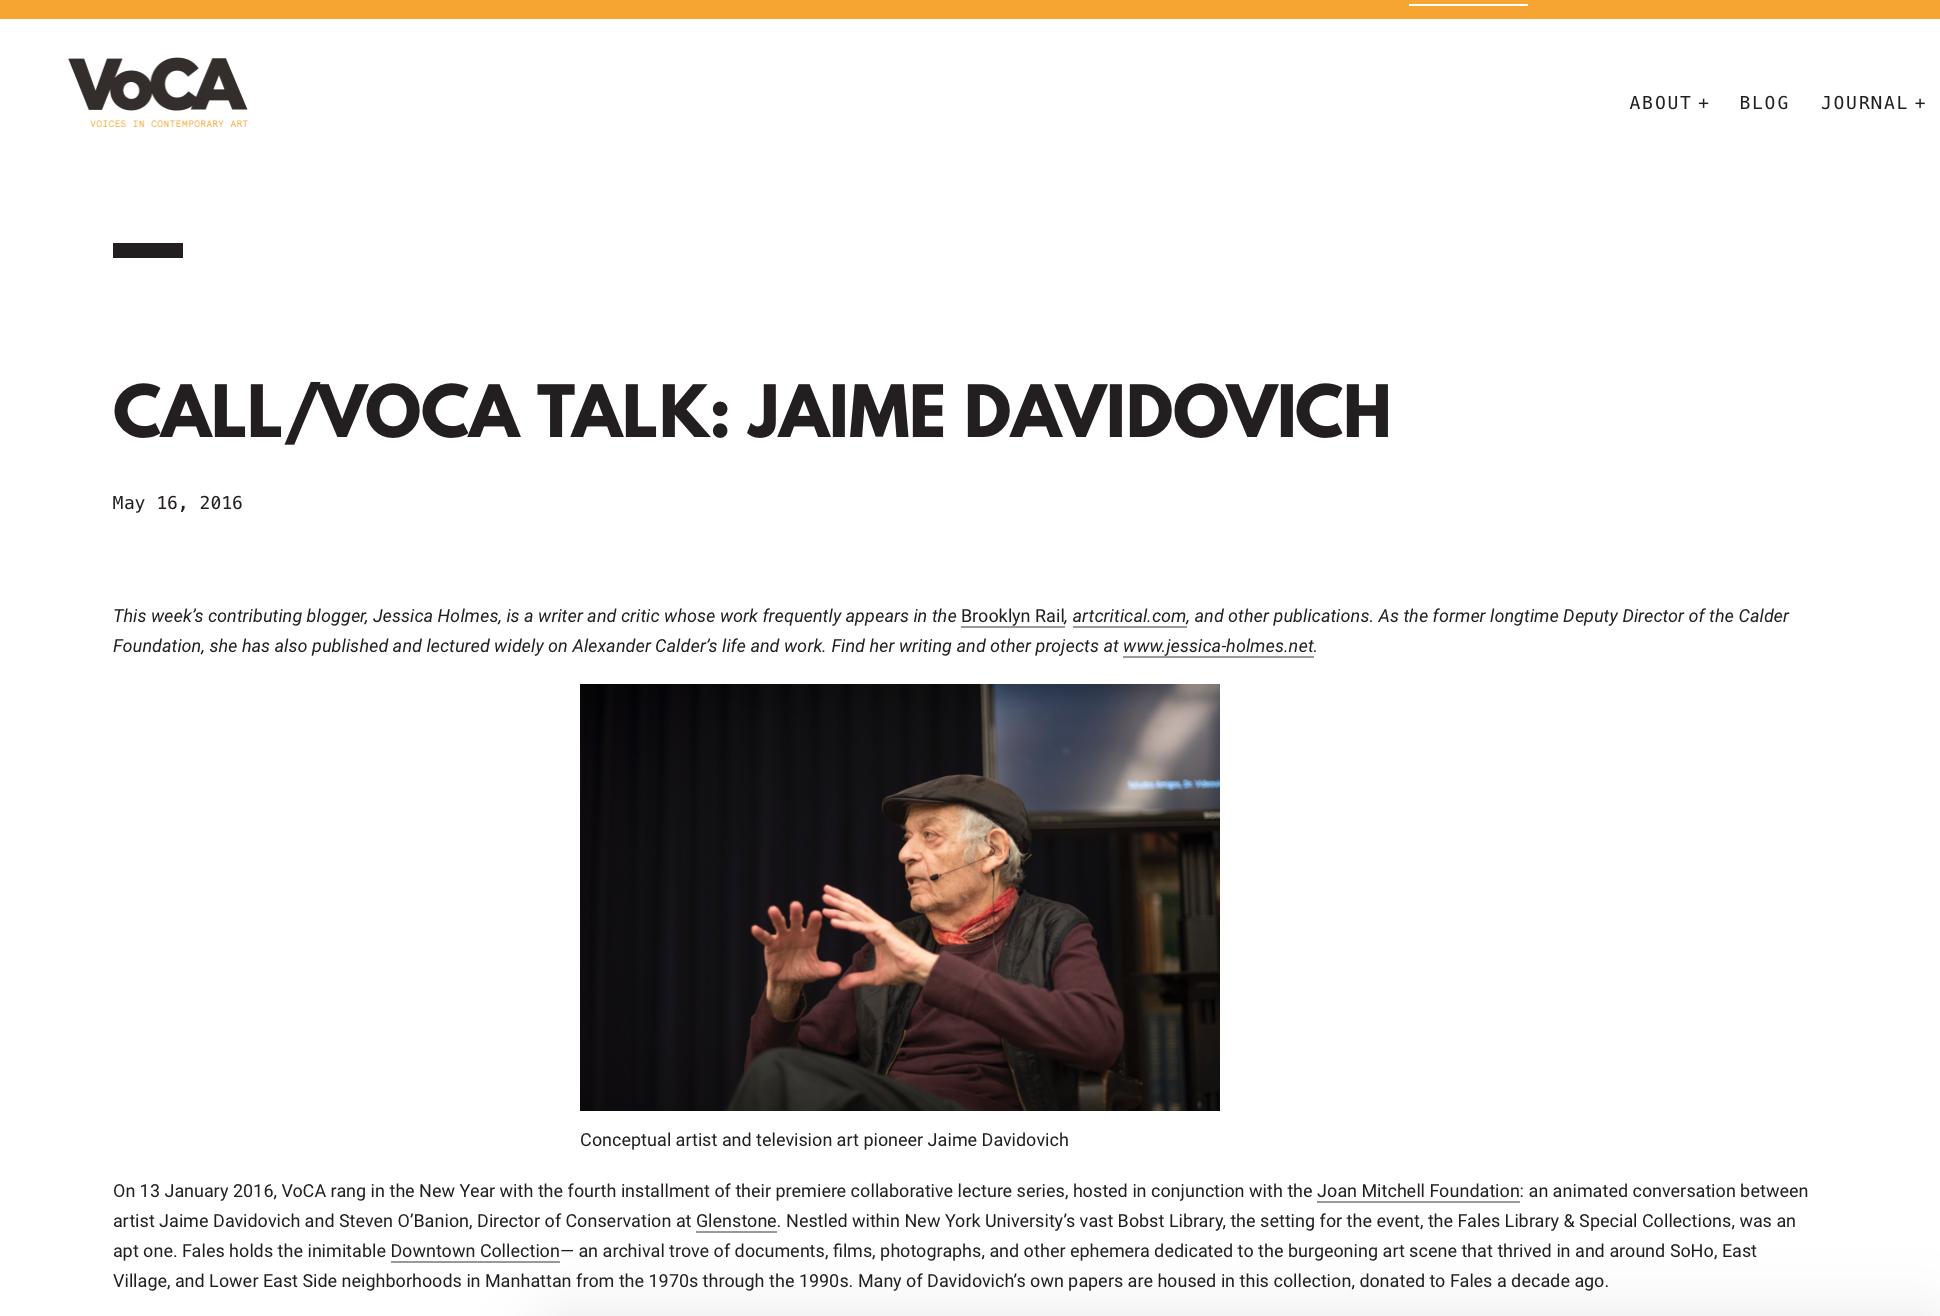 Call/voca talk: jaime davidovich - Voca Network - May 15, 2016